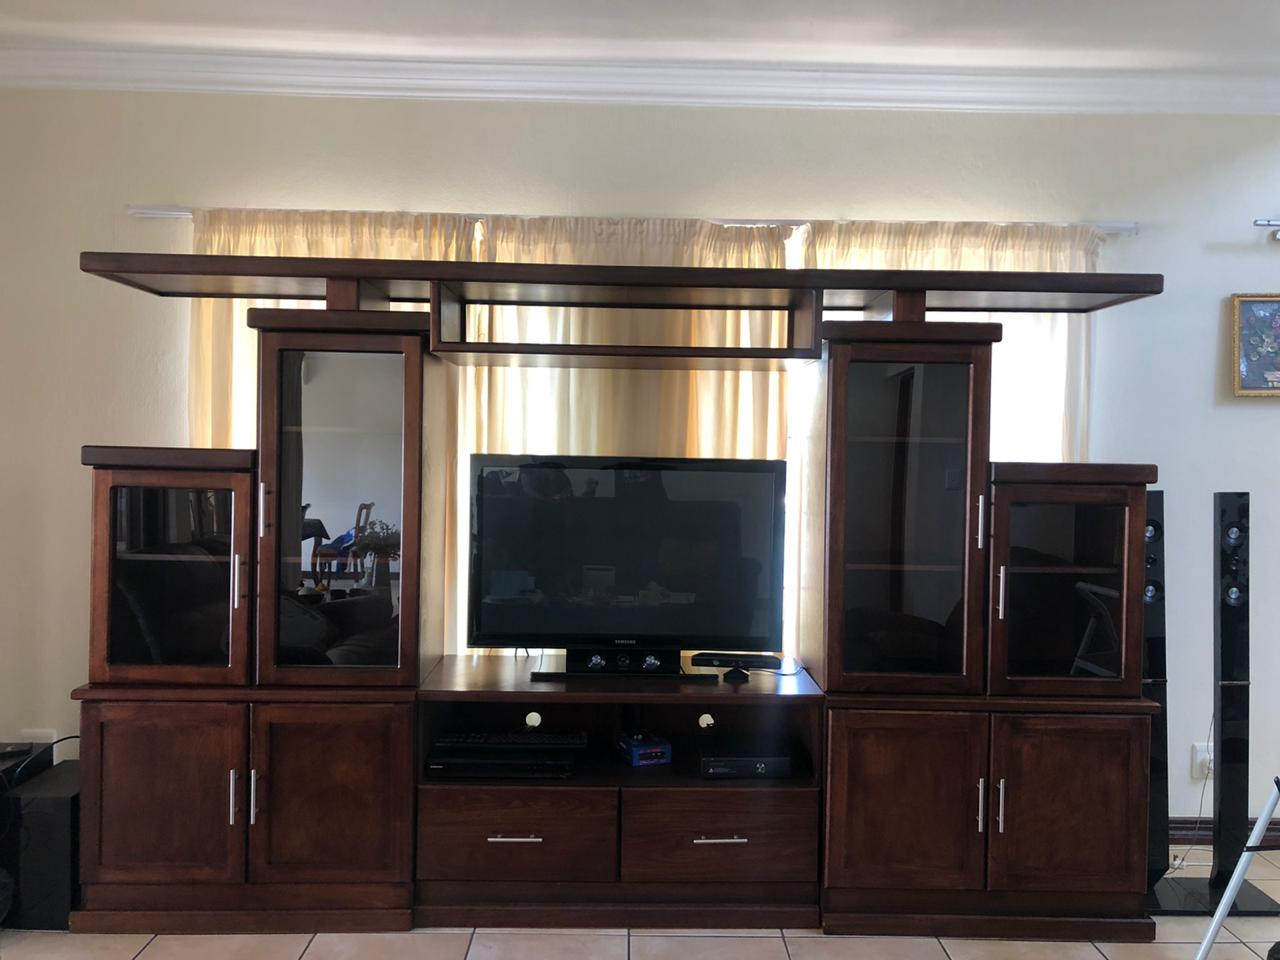 Gorgeous Excellent Condition  TV/Display unit